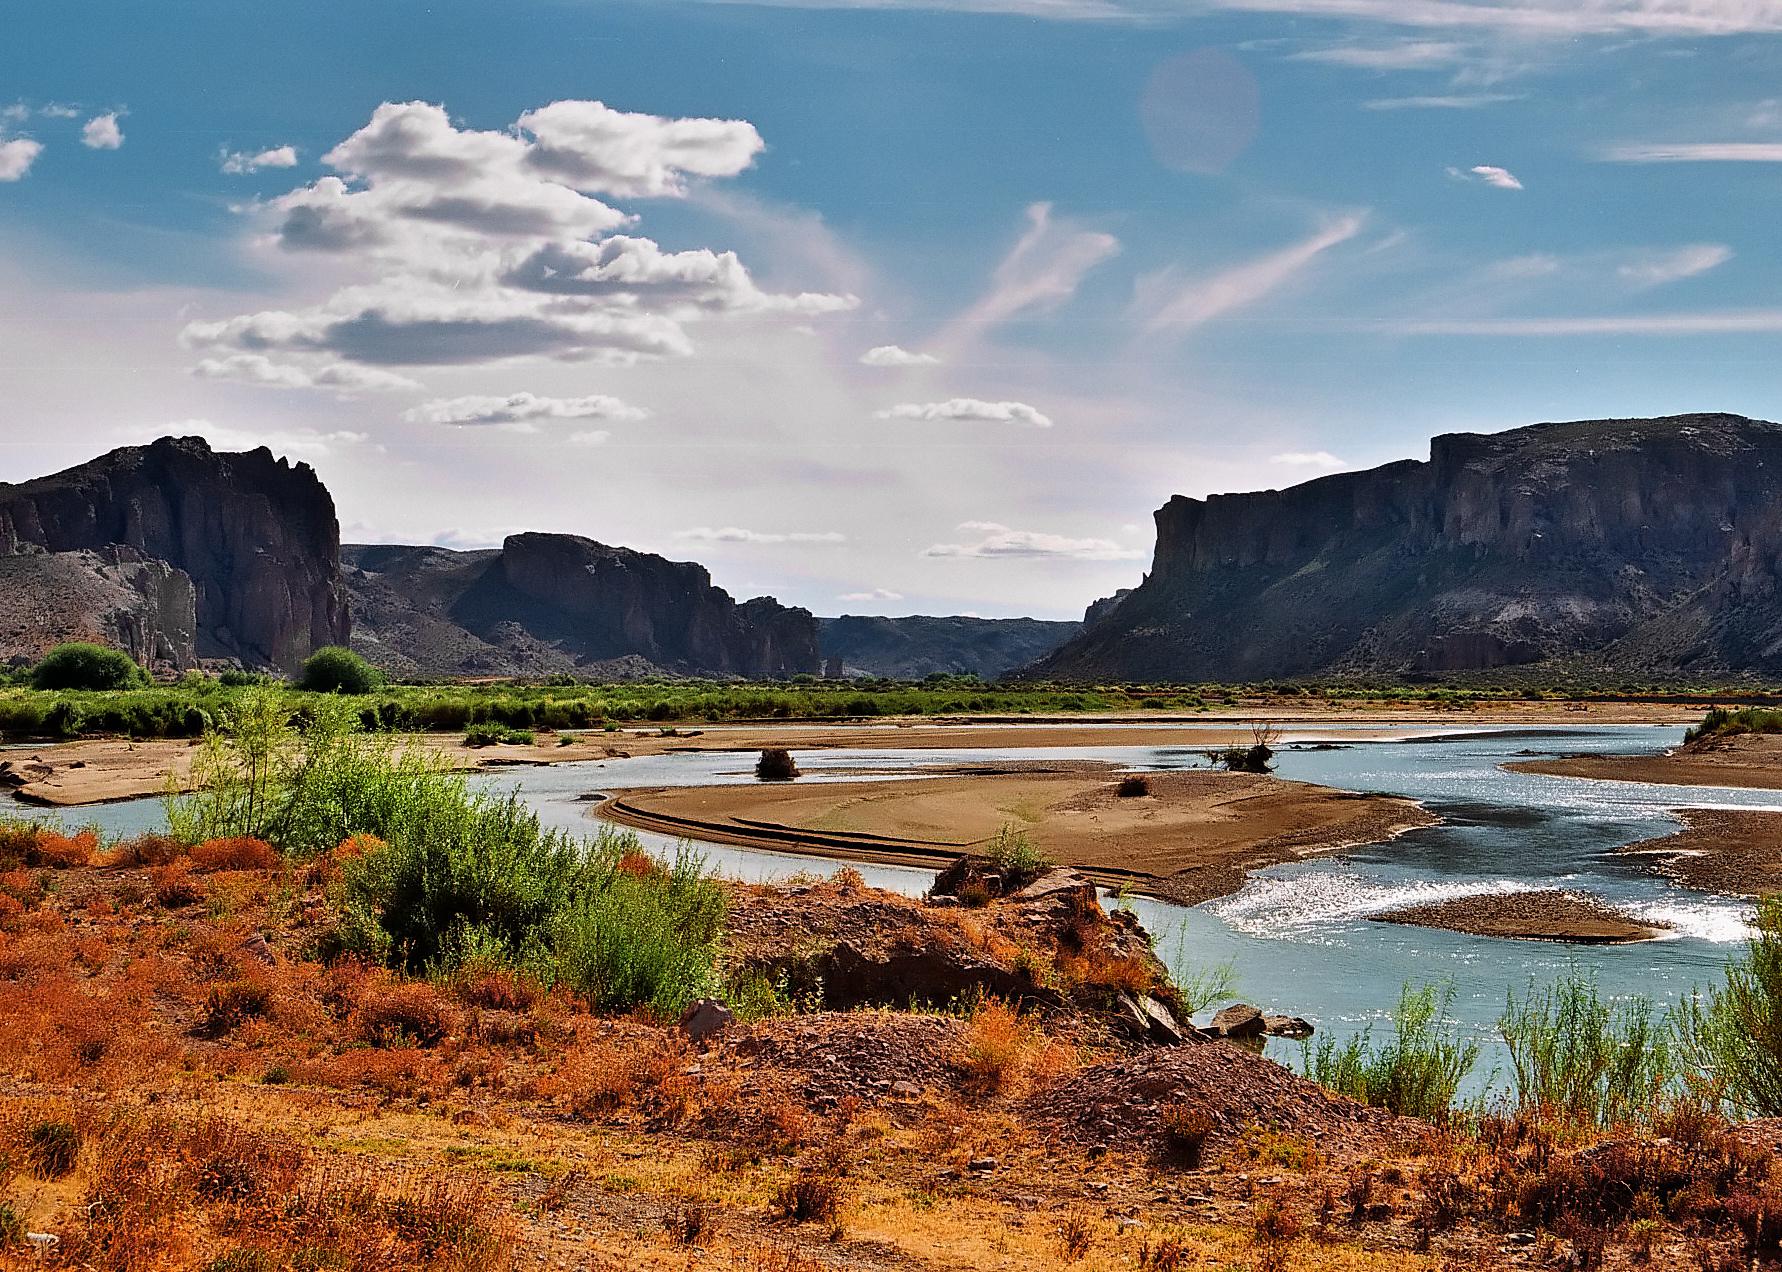 Chubut - Santa Cruz: FLY AND DRIVE